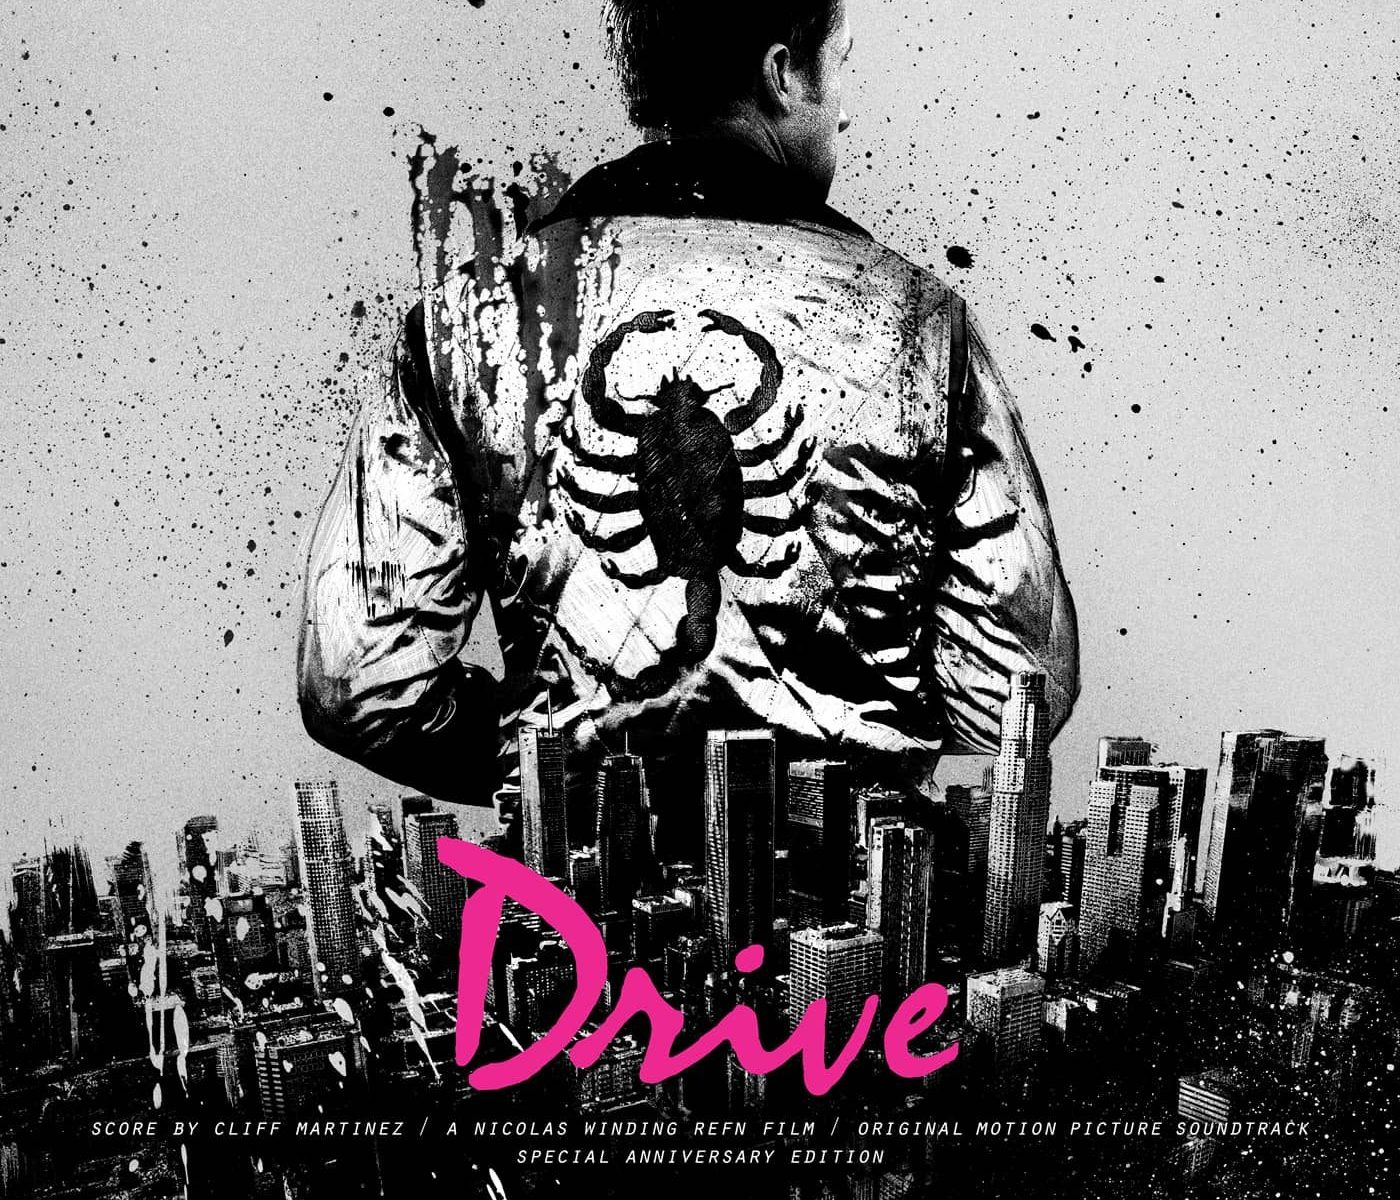 Drive soundtrack vinyl news 10th anniversary variant